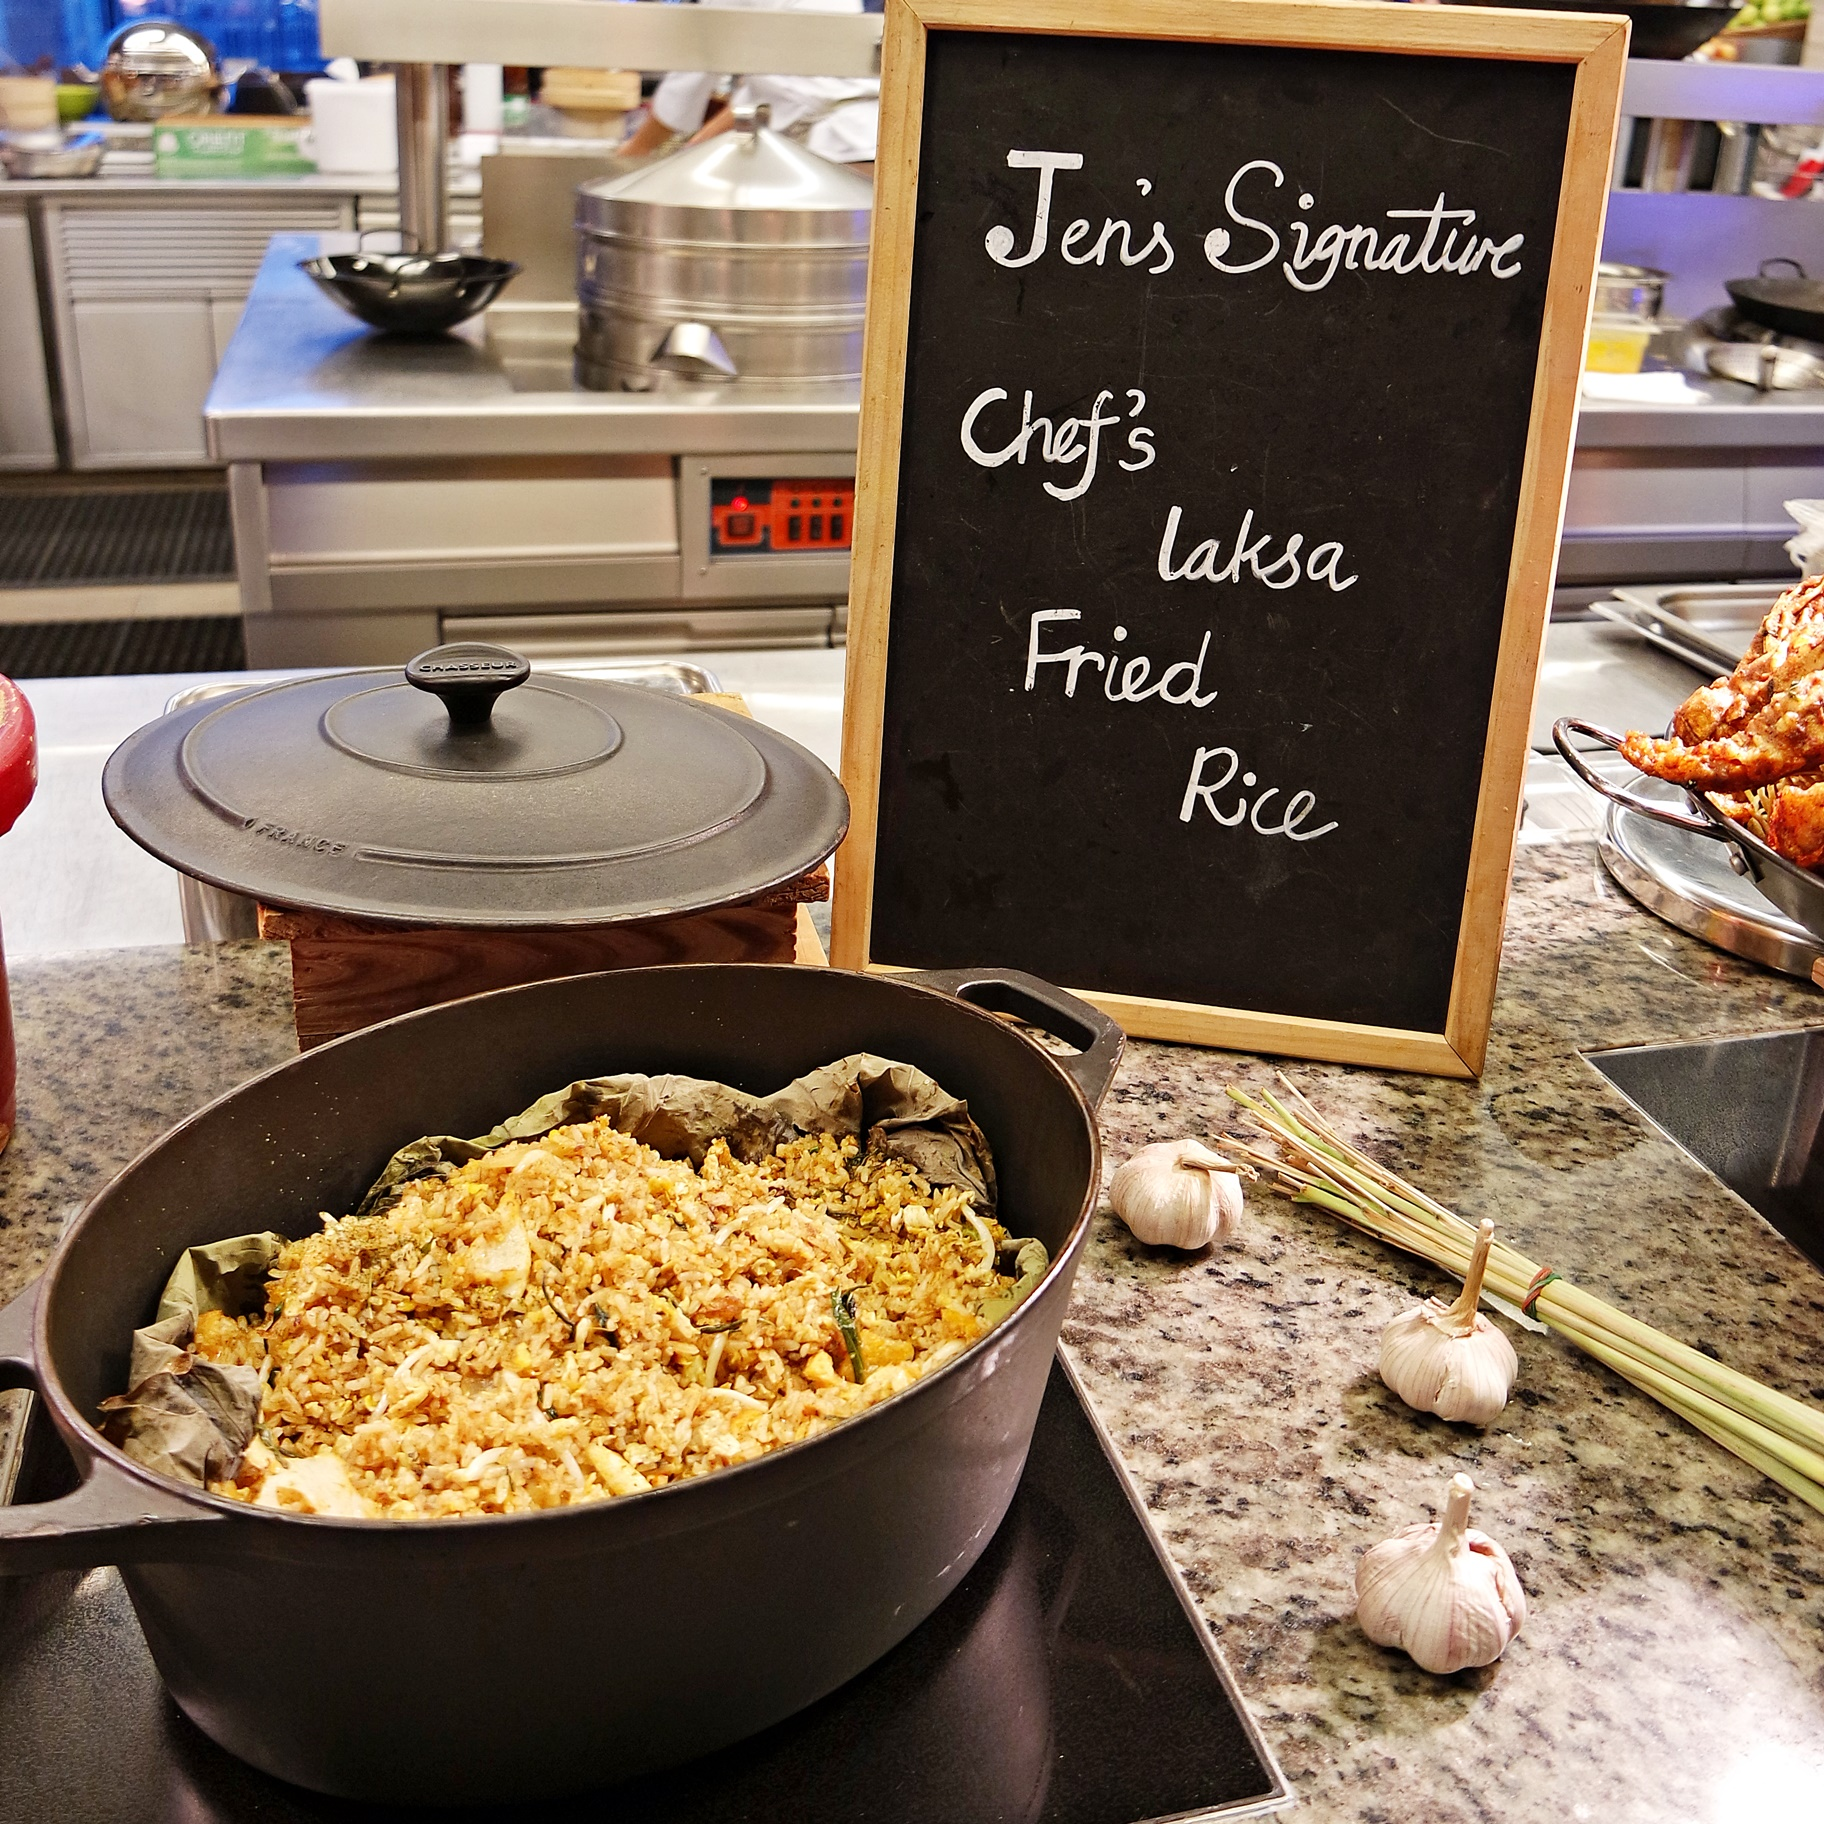 Laska Fried Rice